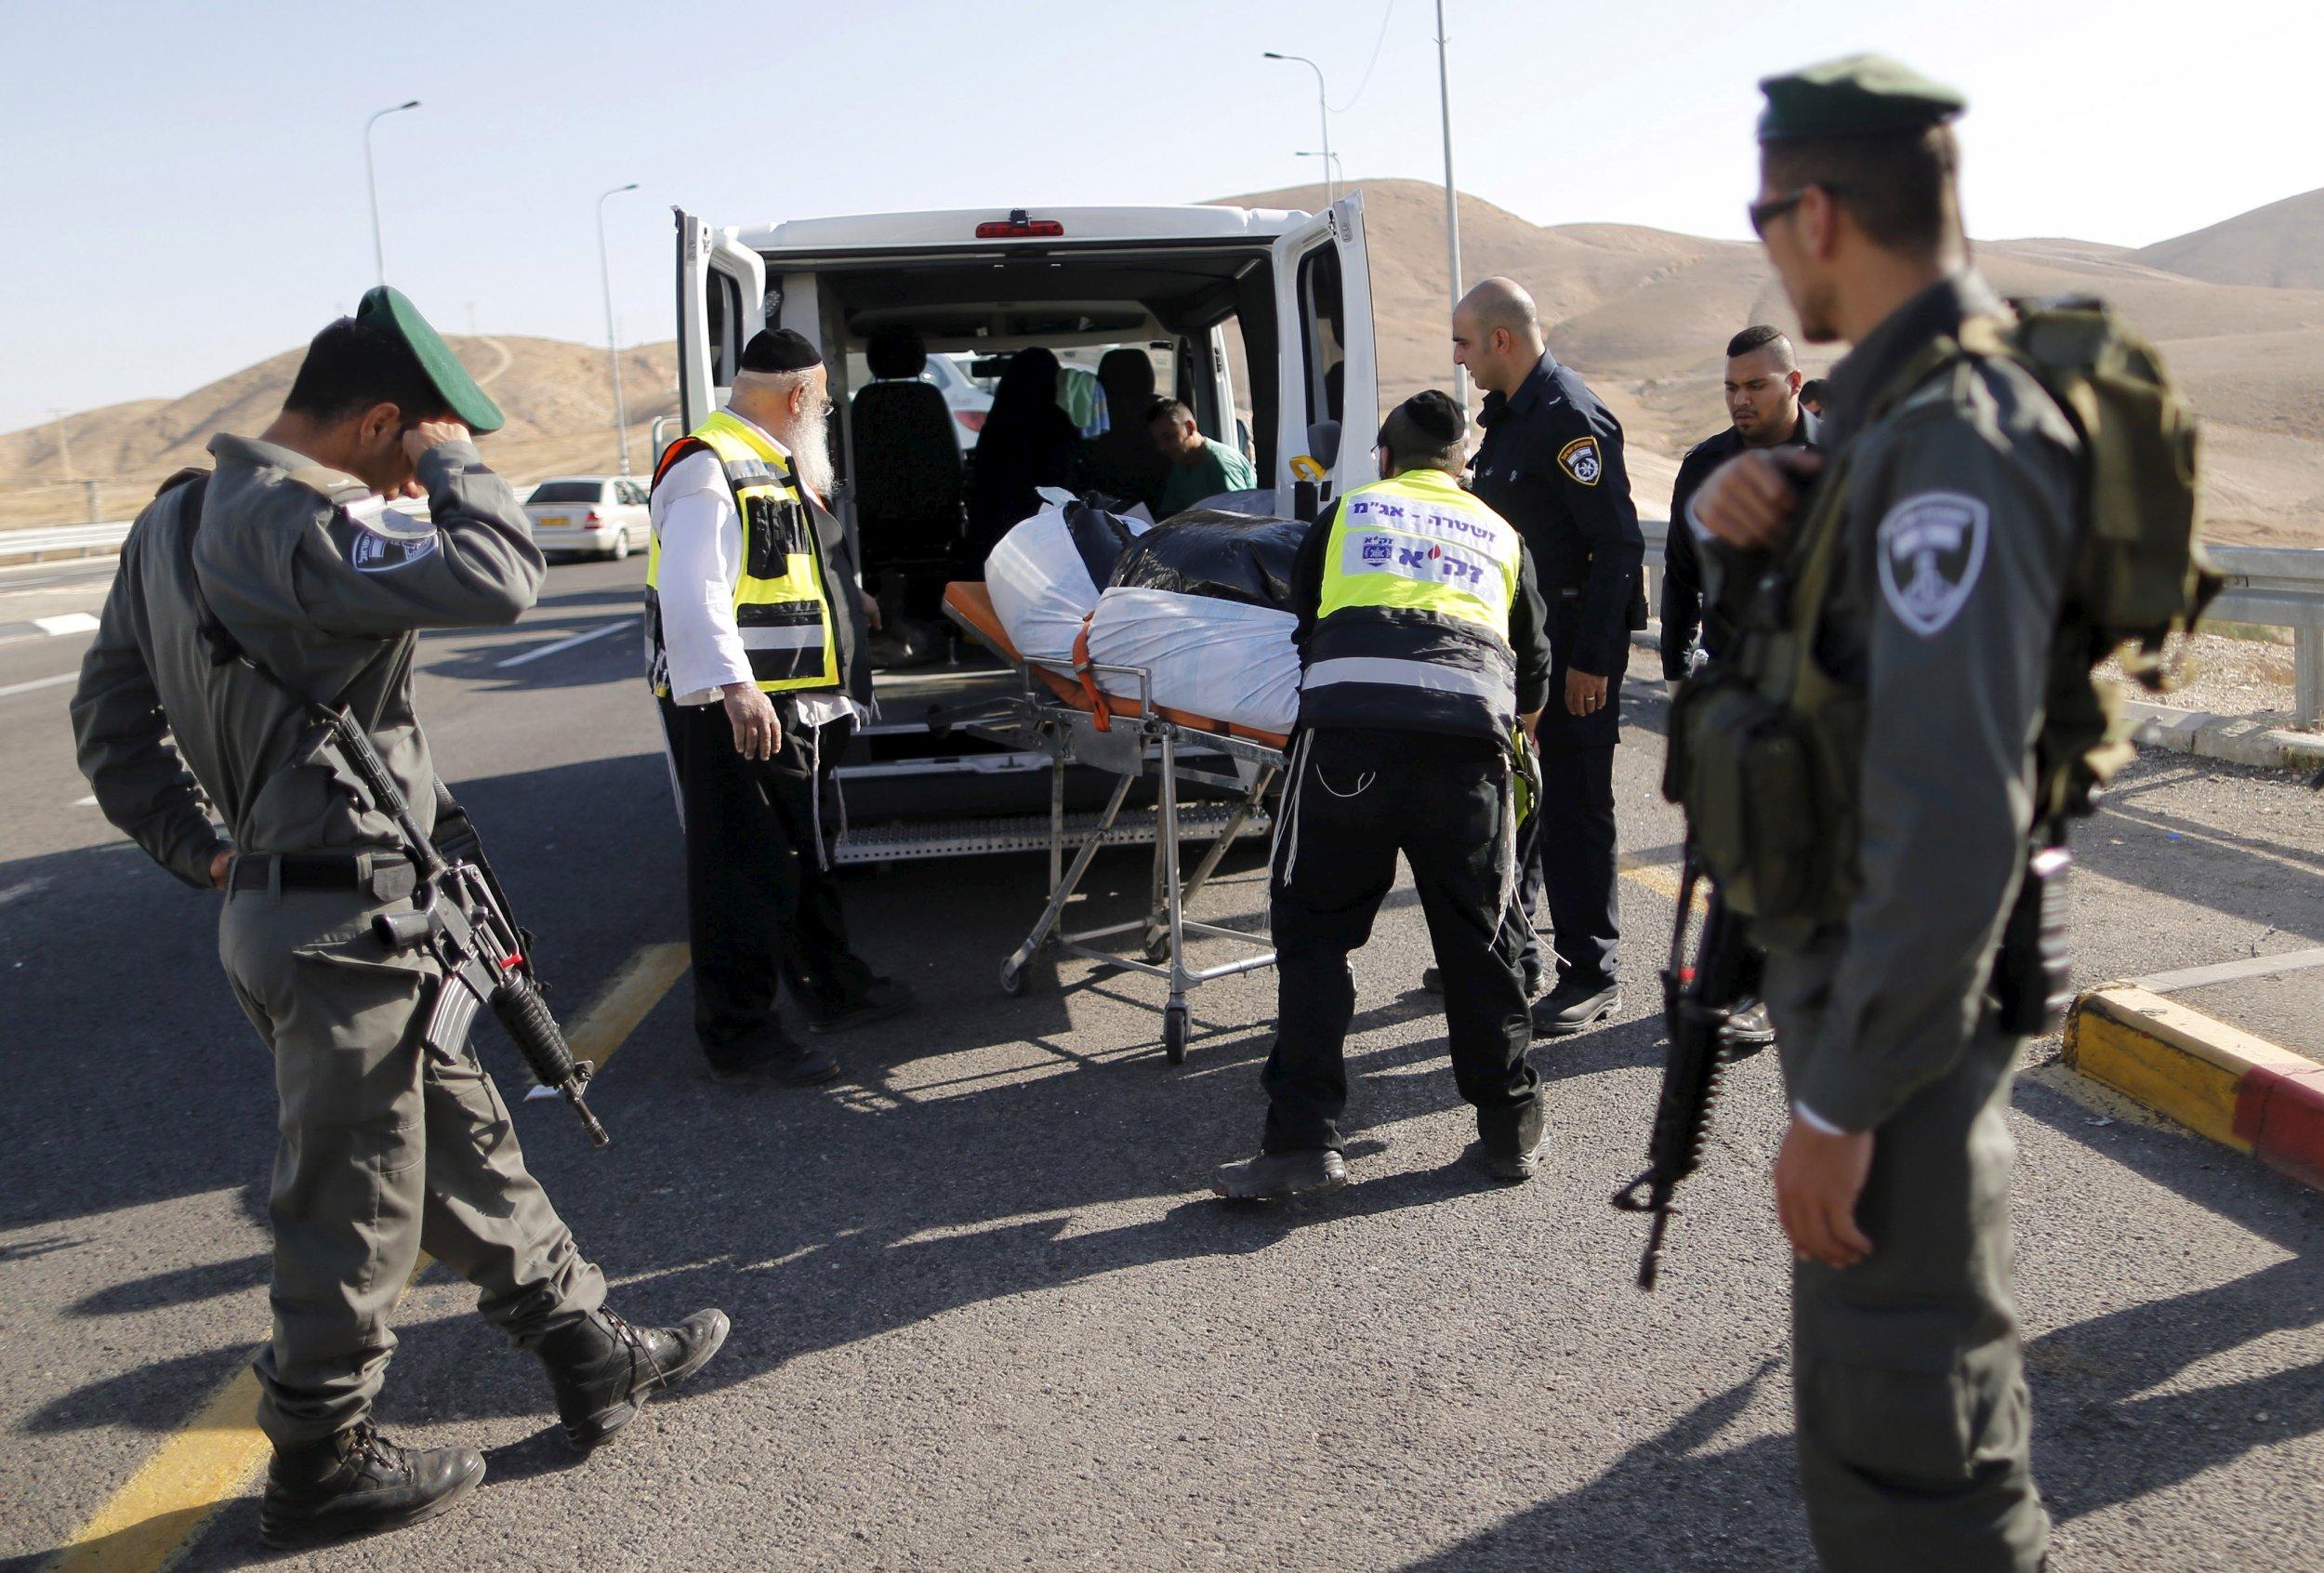 1127_Israel Palestine Violence